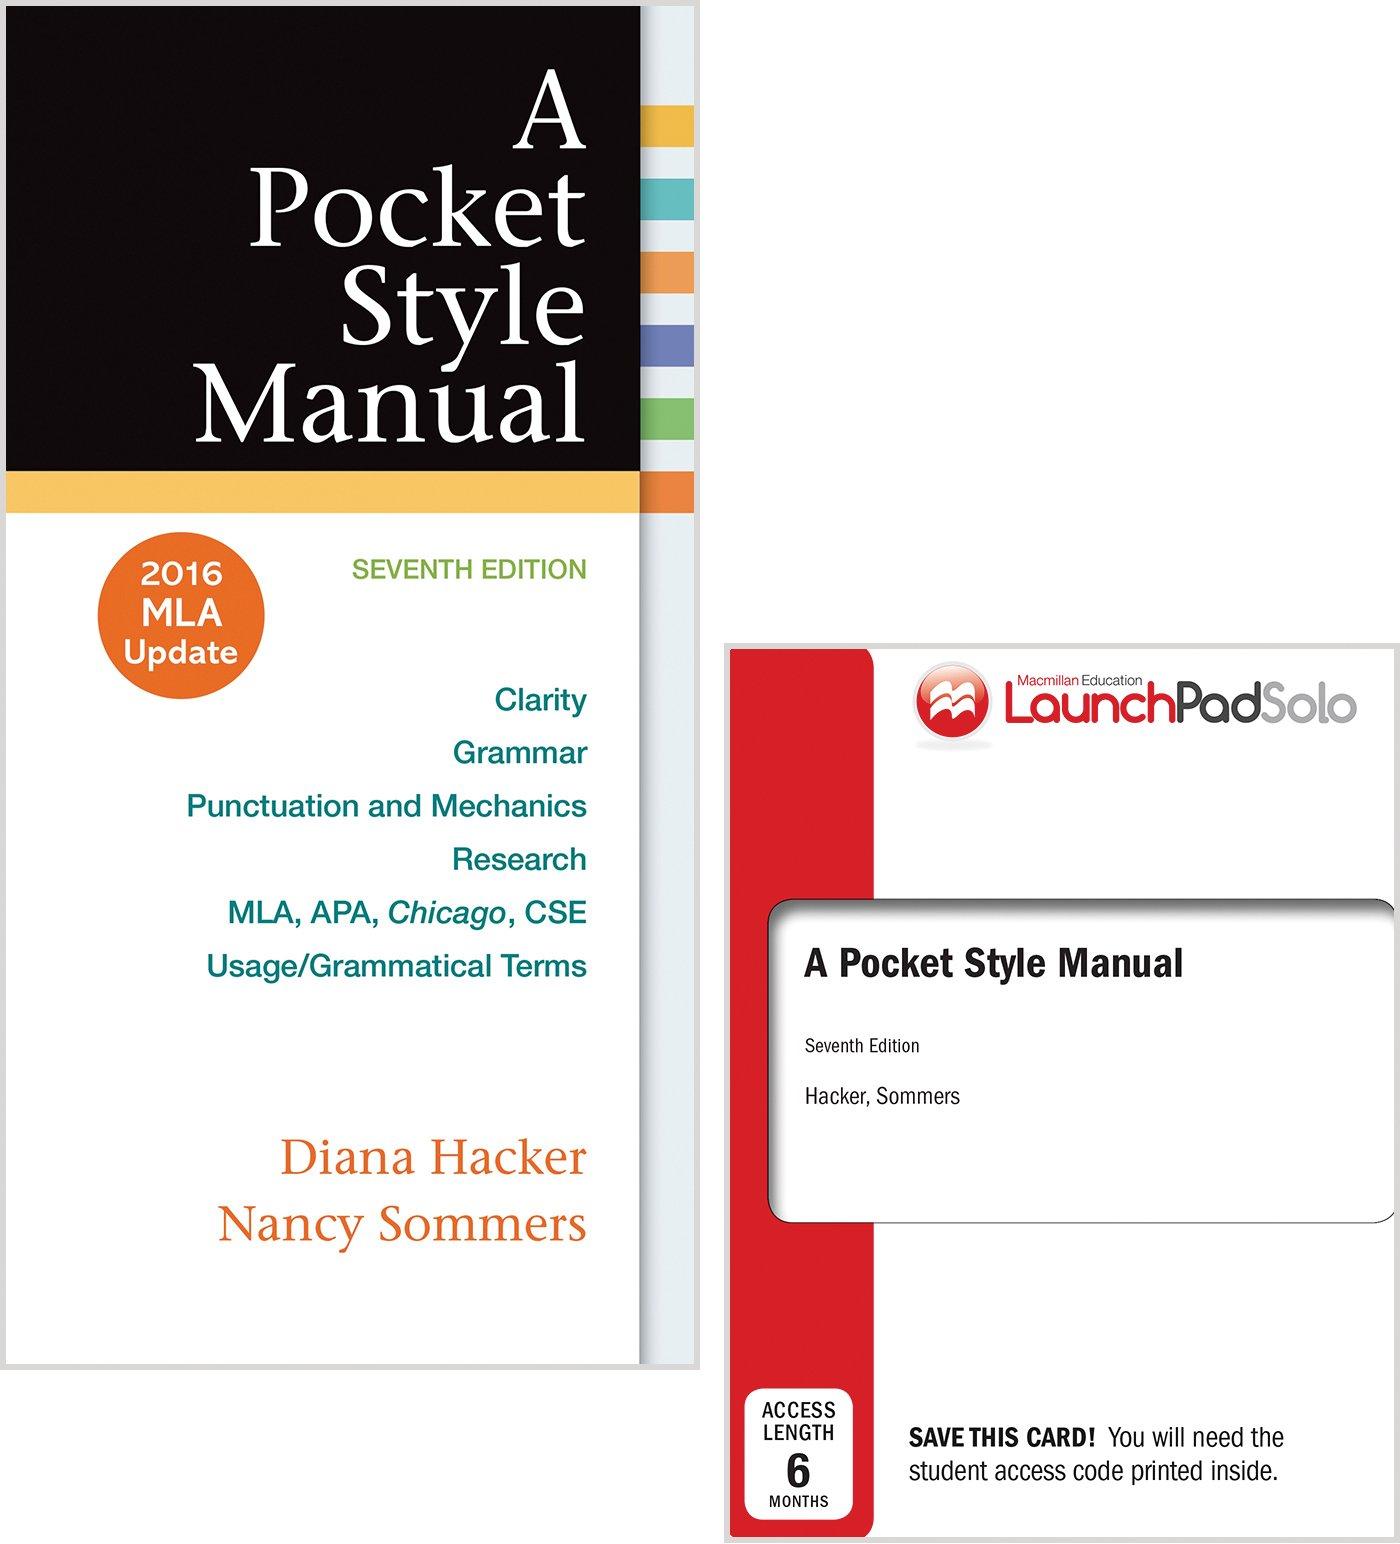 Pocket Style Manual with 2016 MLA Update: University Diana Hacker,  University Nancy Sommers: 9781319085469: Books - Amazon.ca